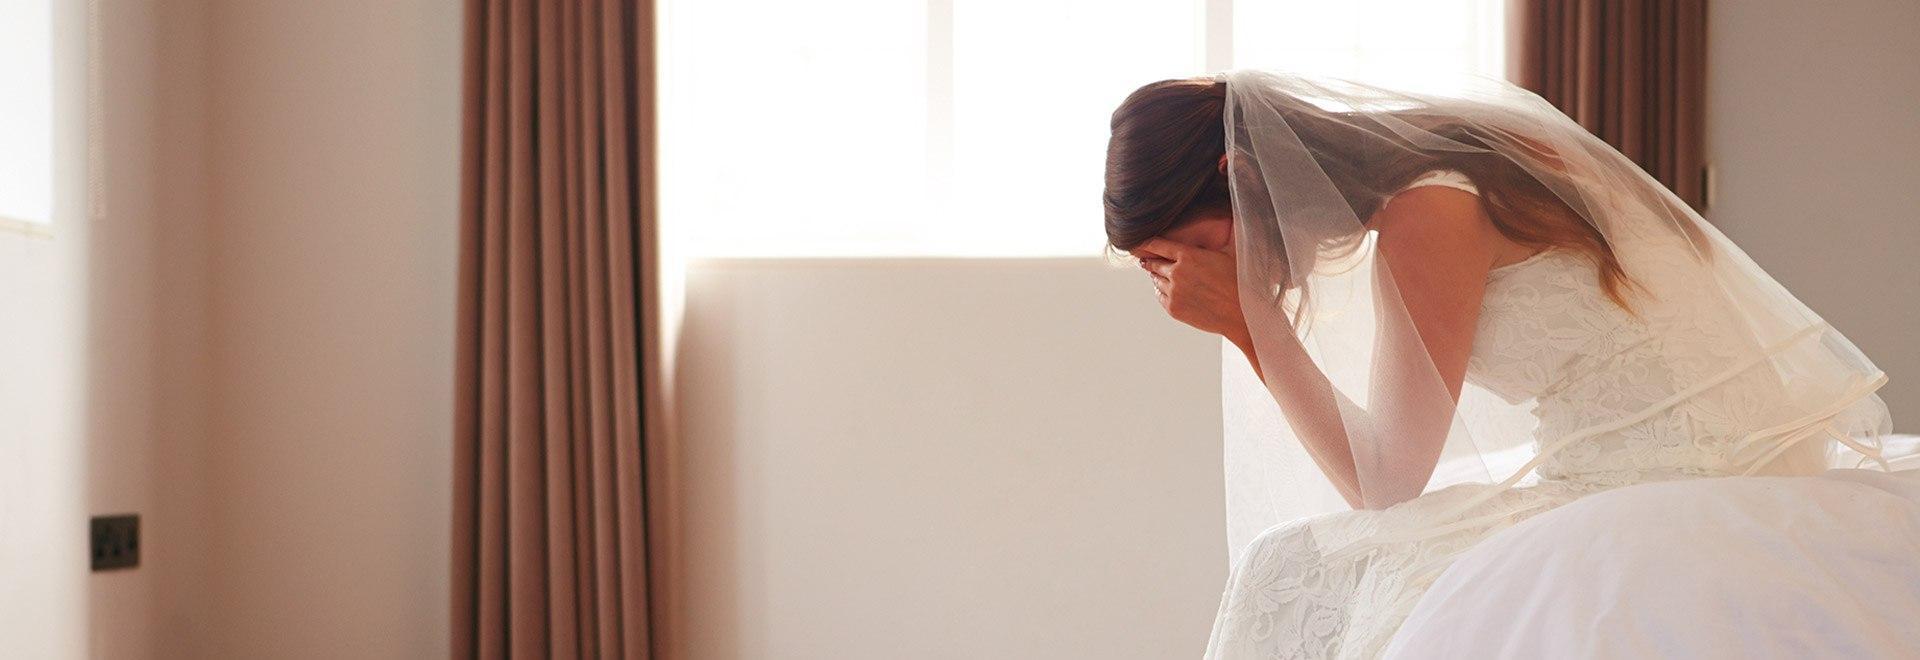 Matrimoni da incubo